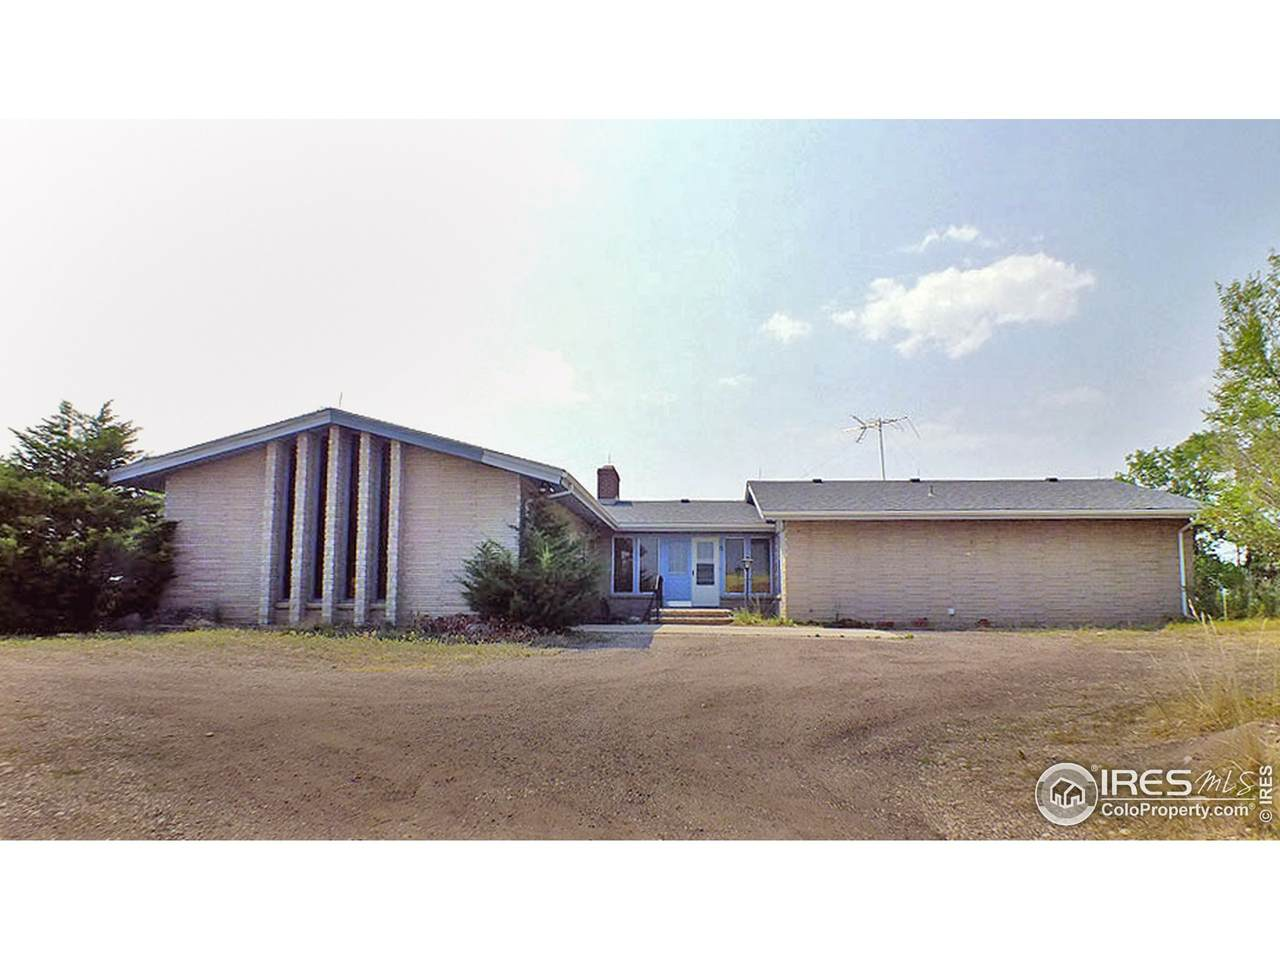 5522 County Road 40 - Photo 1